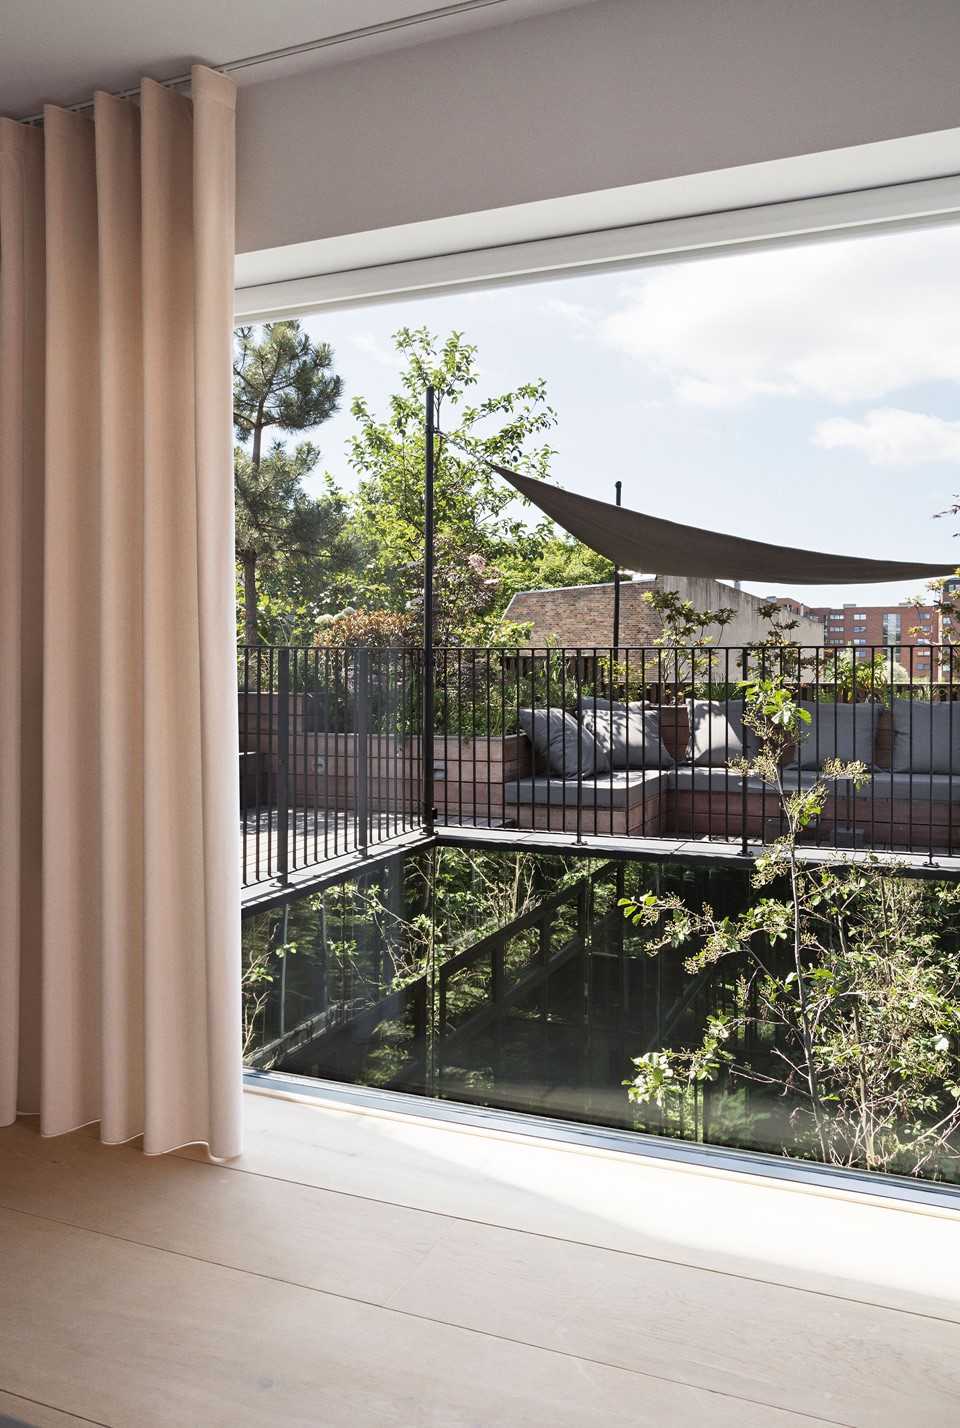 oak-hardwood-plank-flooring-heartoak_natural-oil_peters-house_office-view_dinesen.jpg